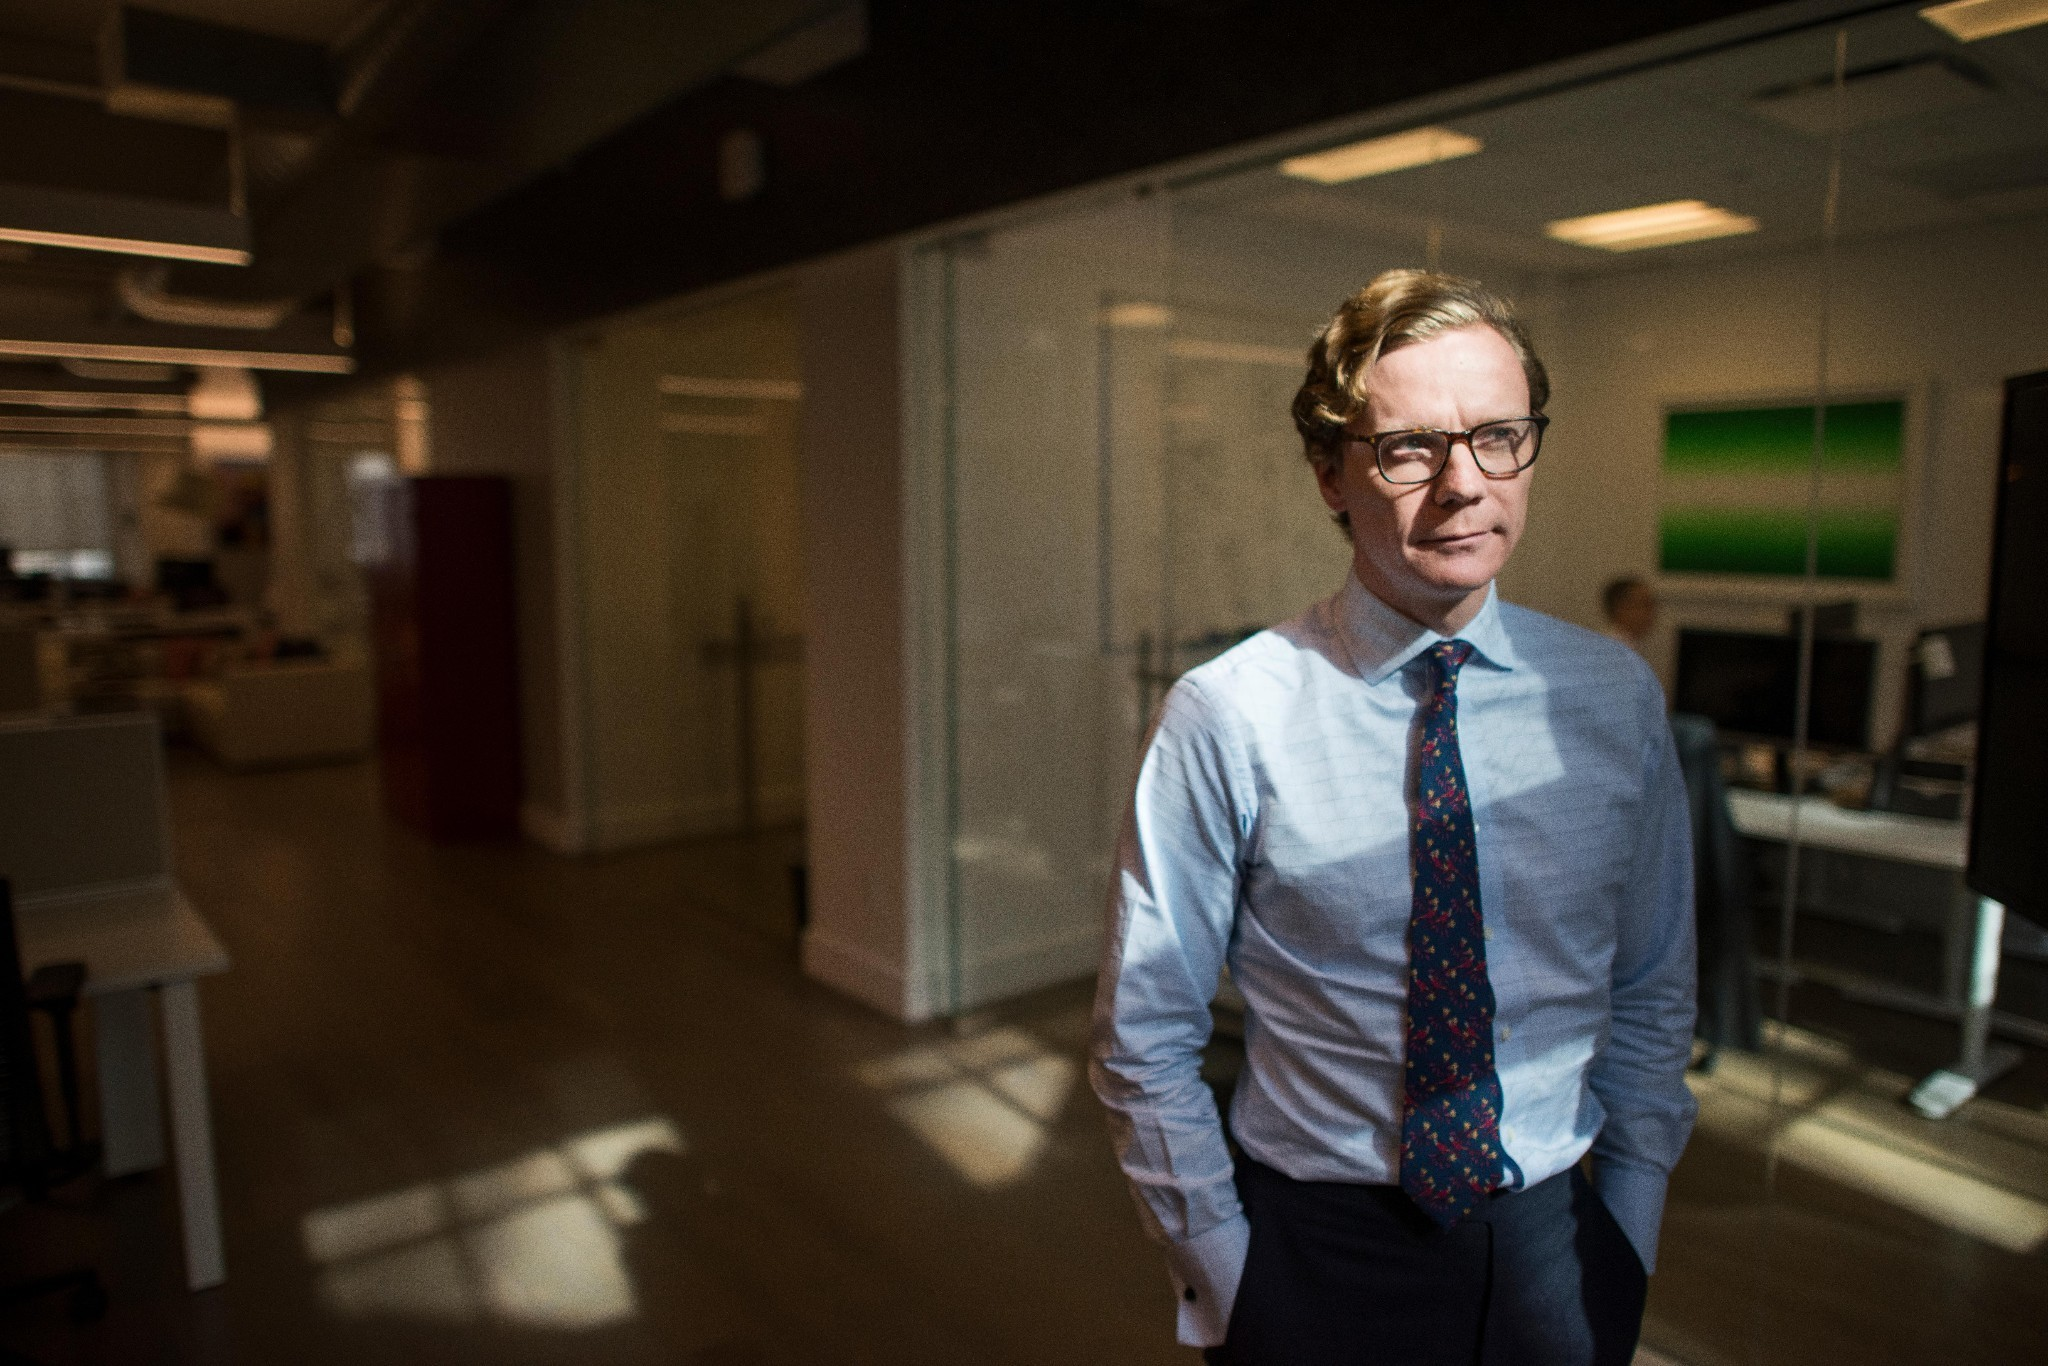 'I made Steve Bannon's psychological warfare tool': meet the data war whistleblower